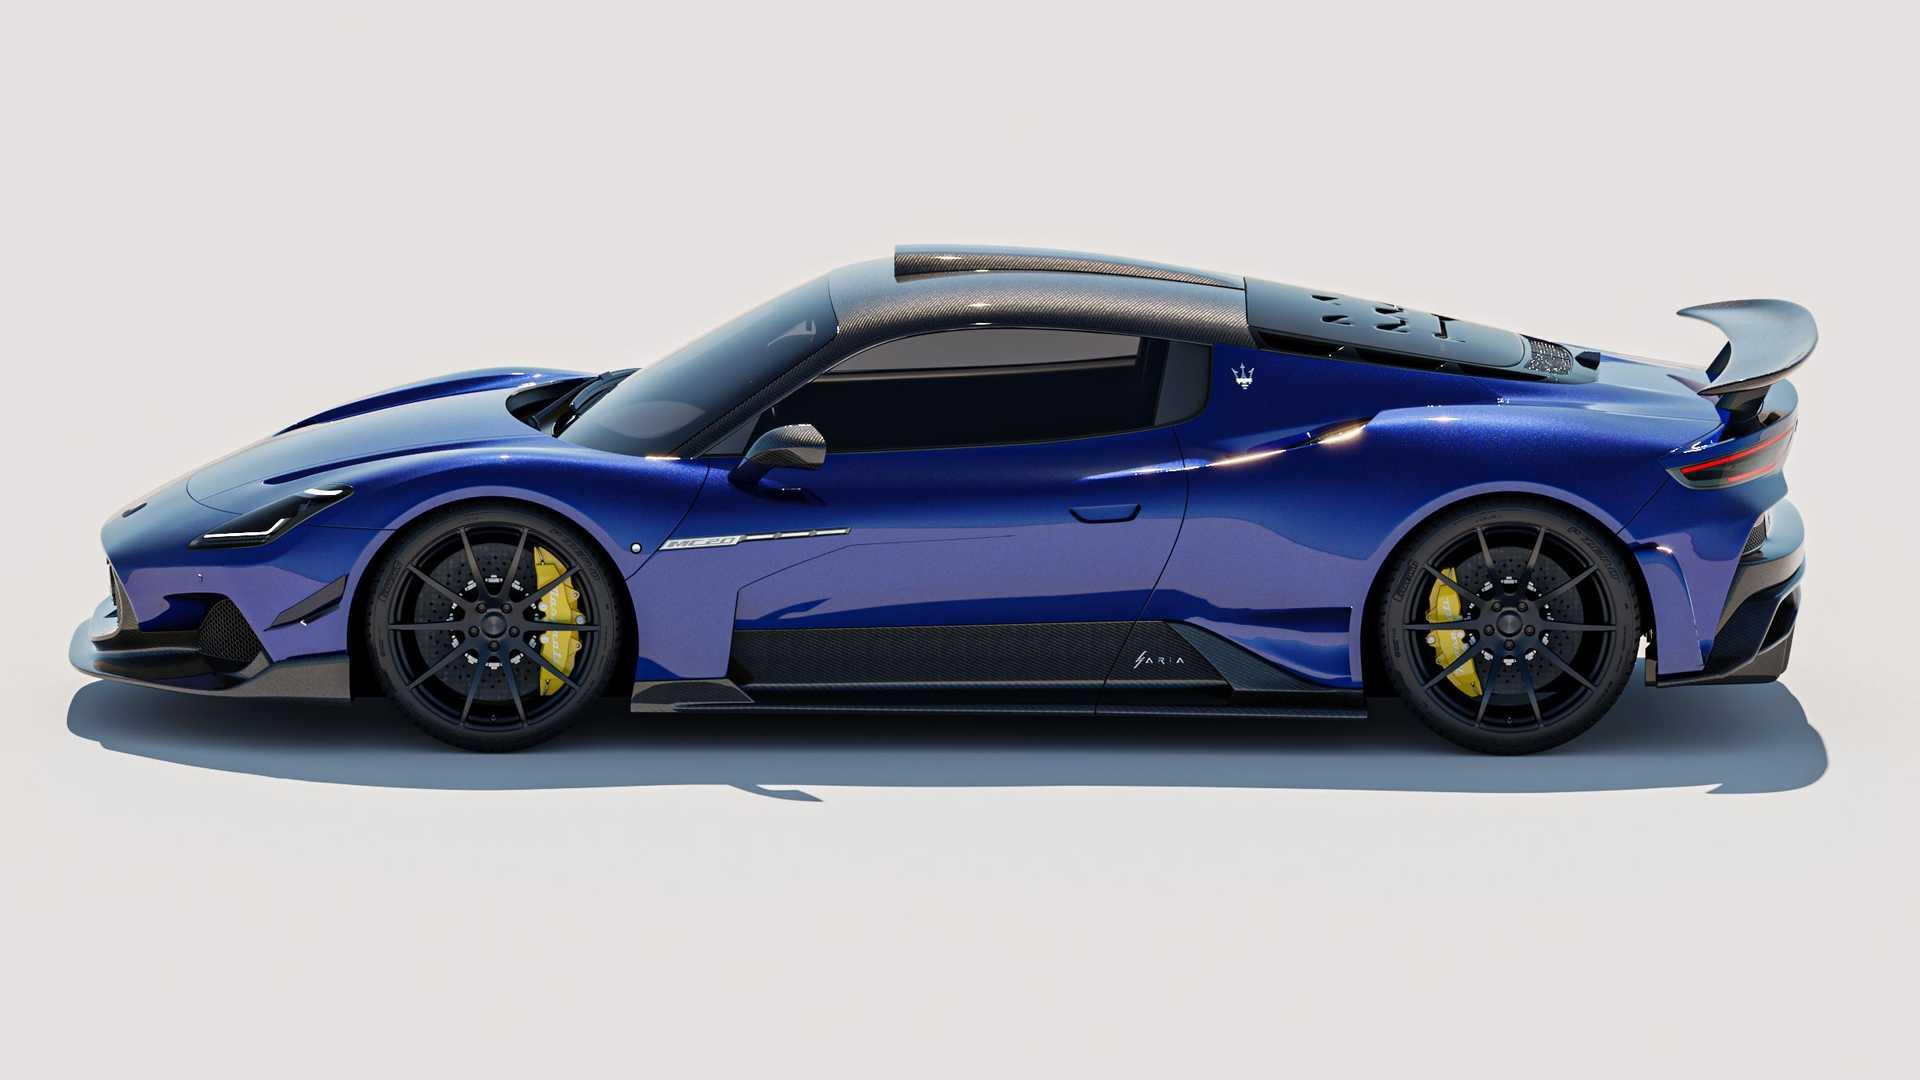 Maserati-MC20-bodykit-by-7-Designs-5